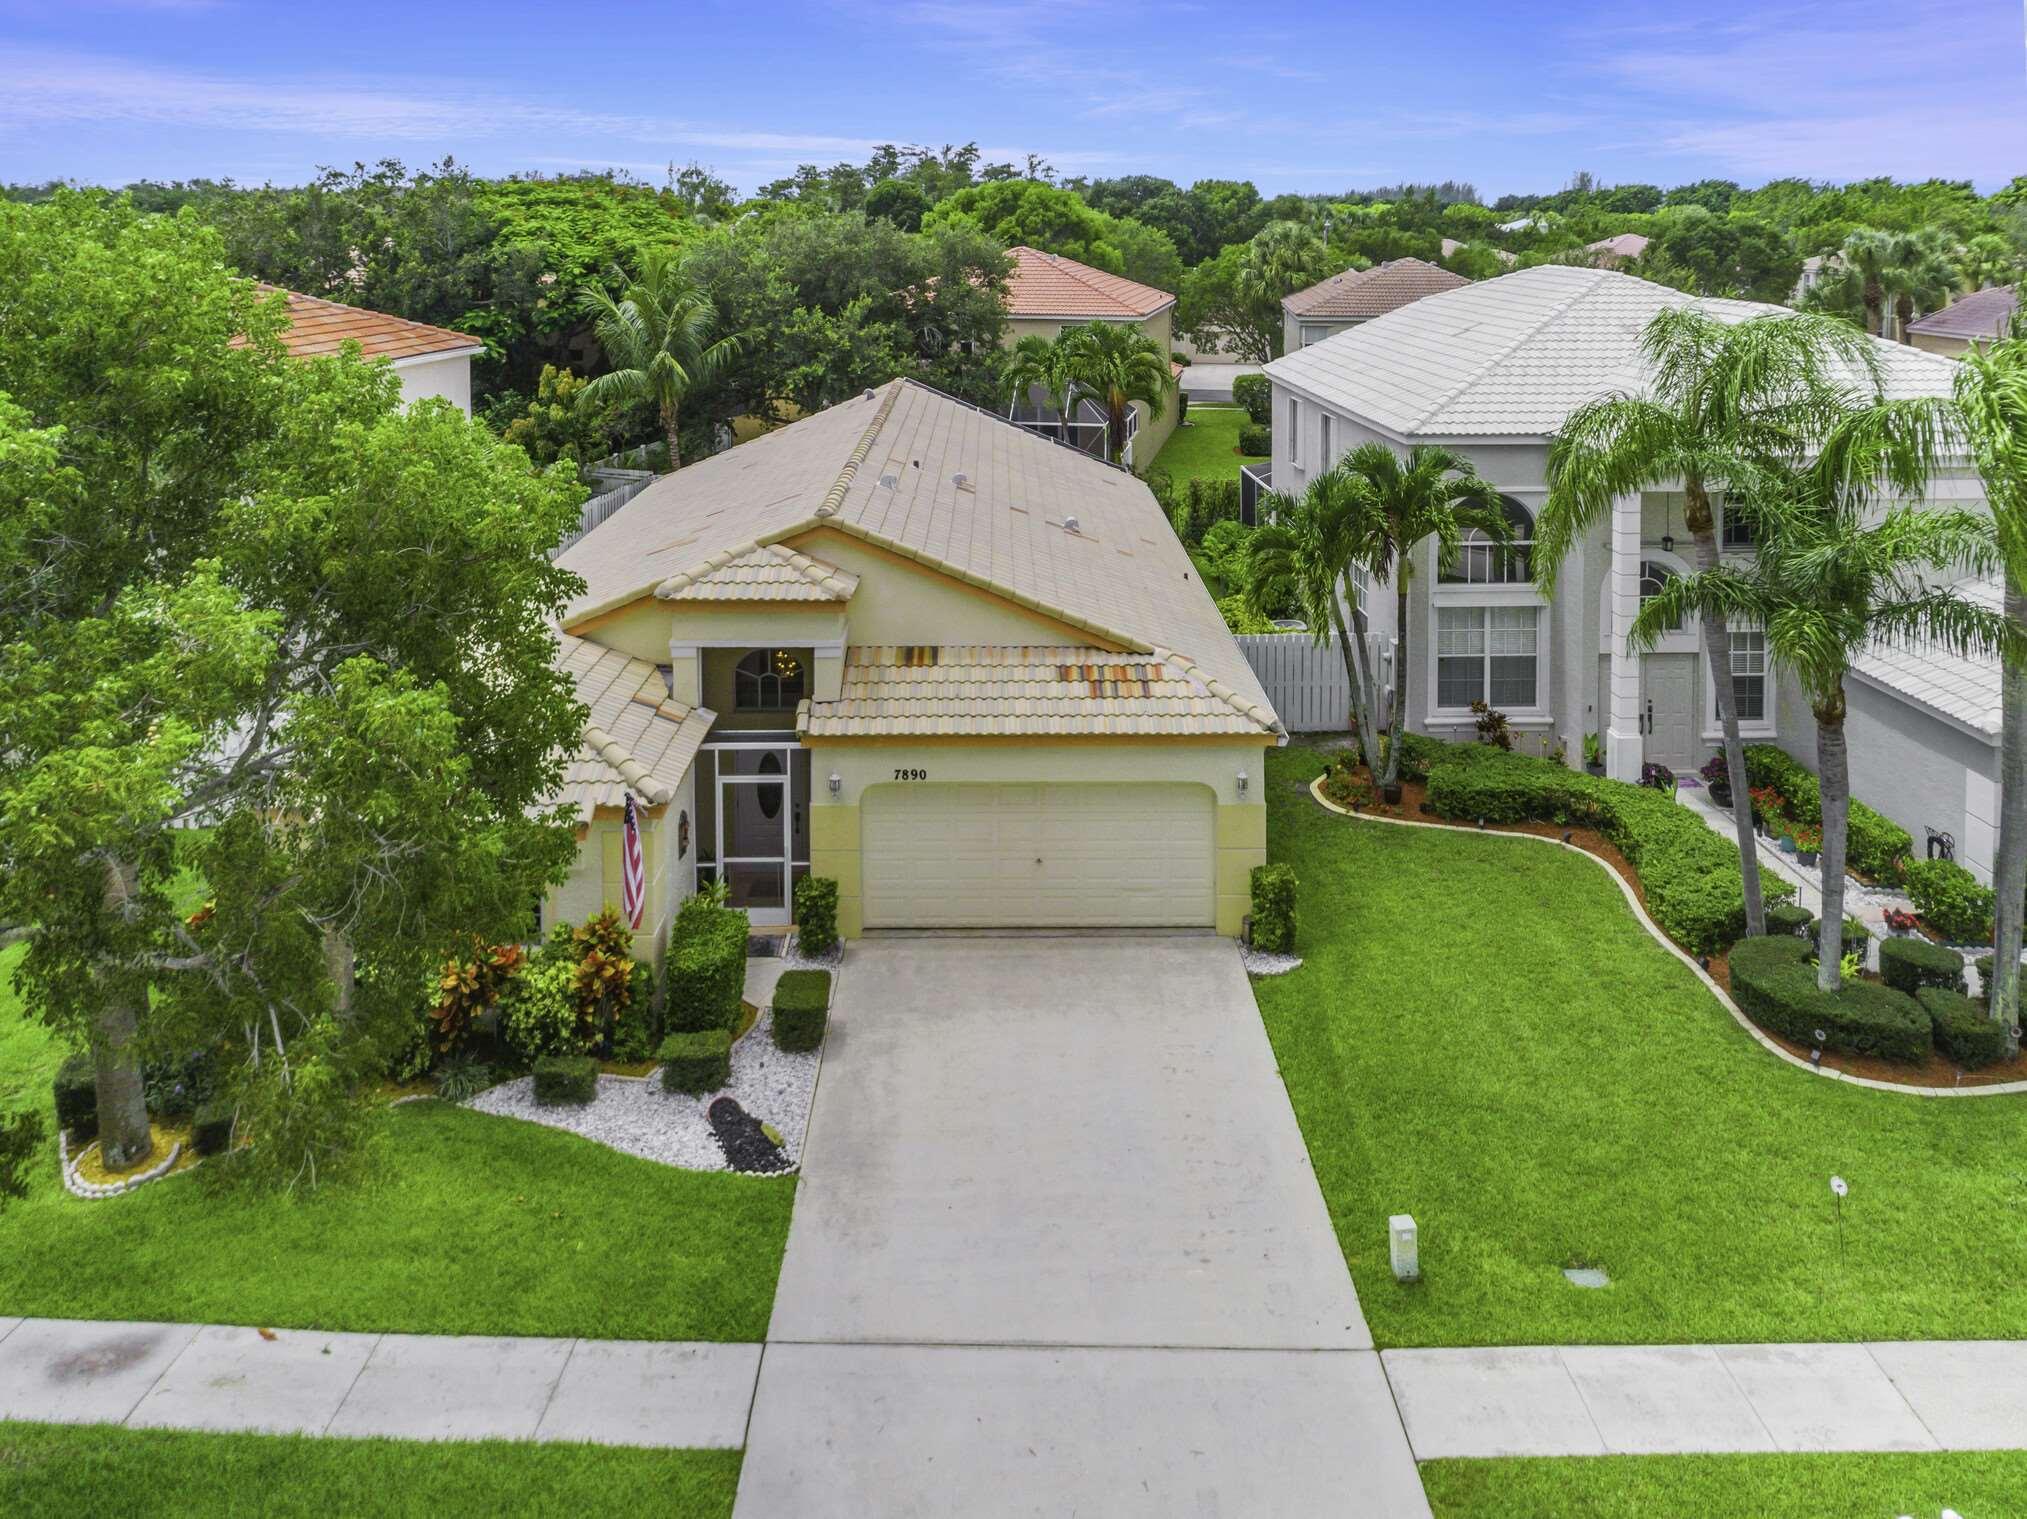 7890 Springvale Drive, Lake Worth, FL 33467